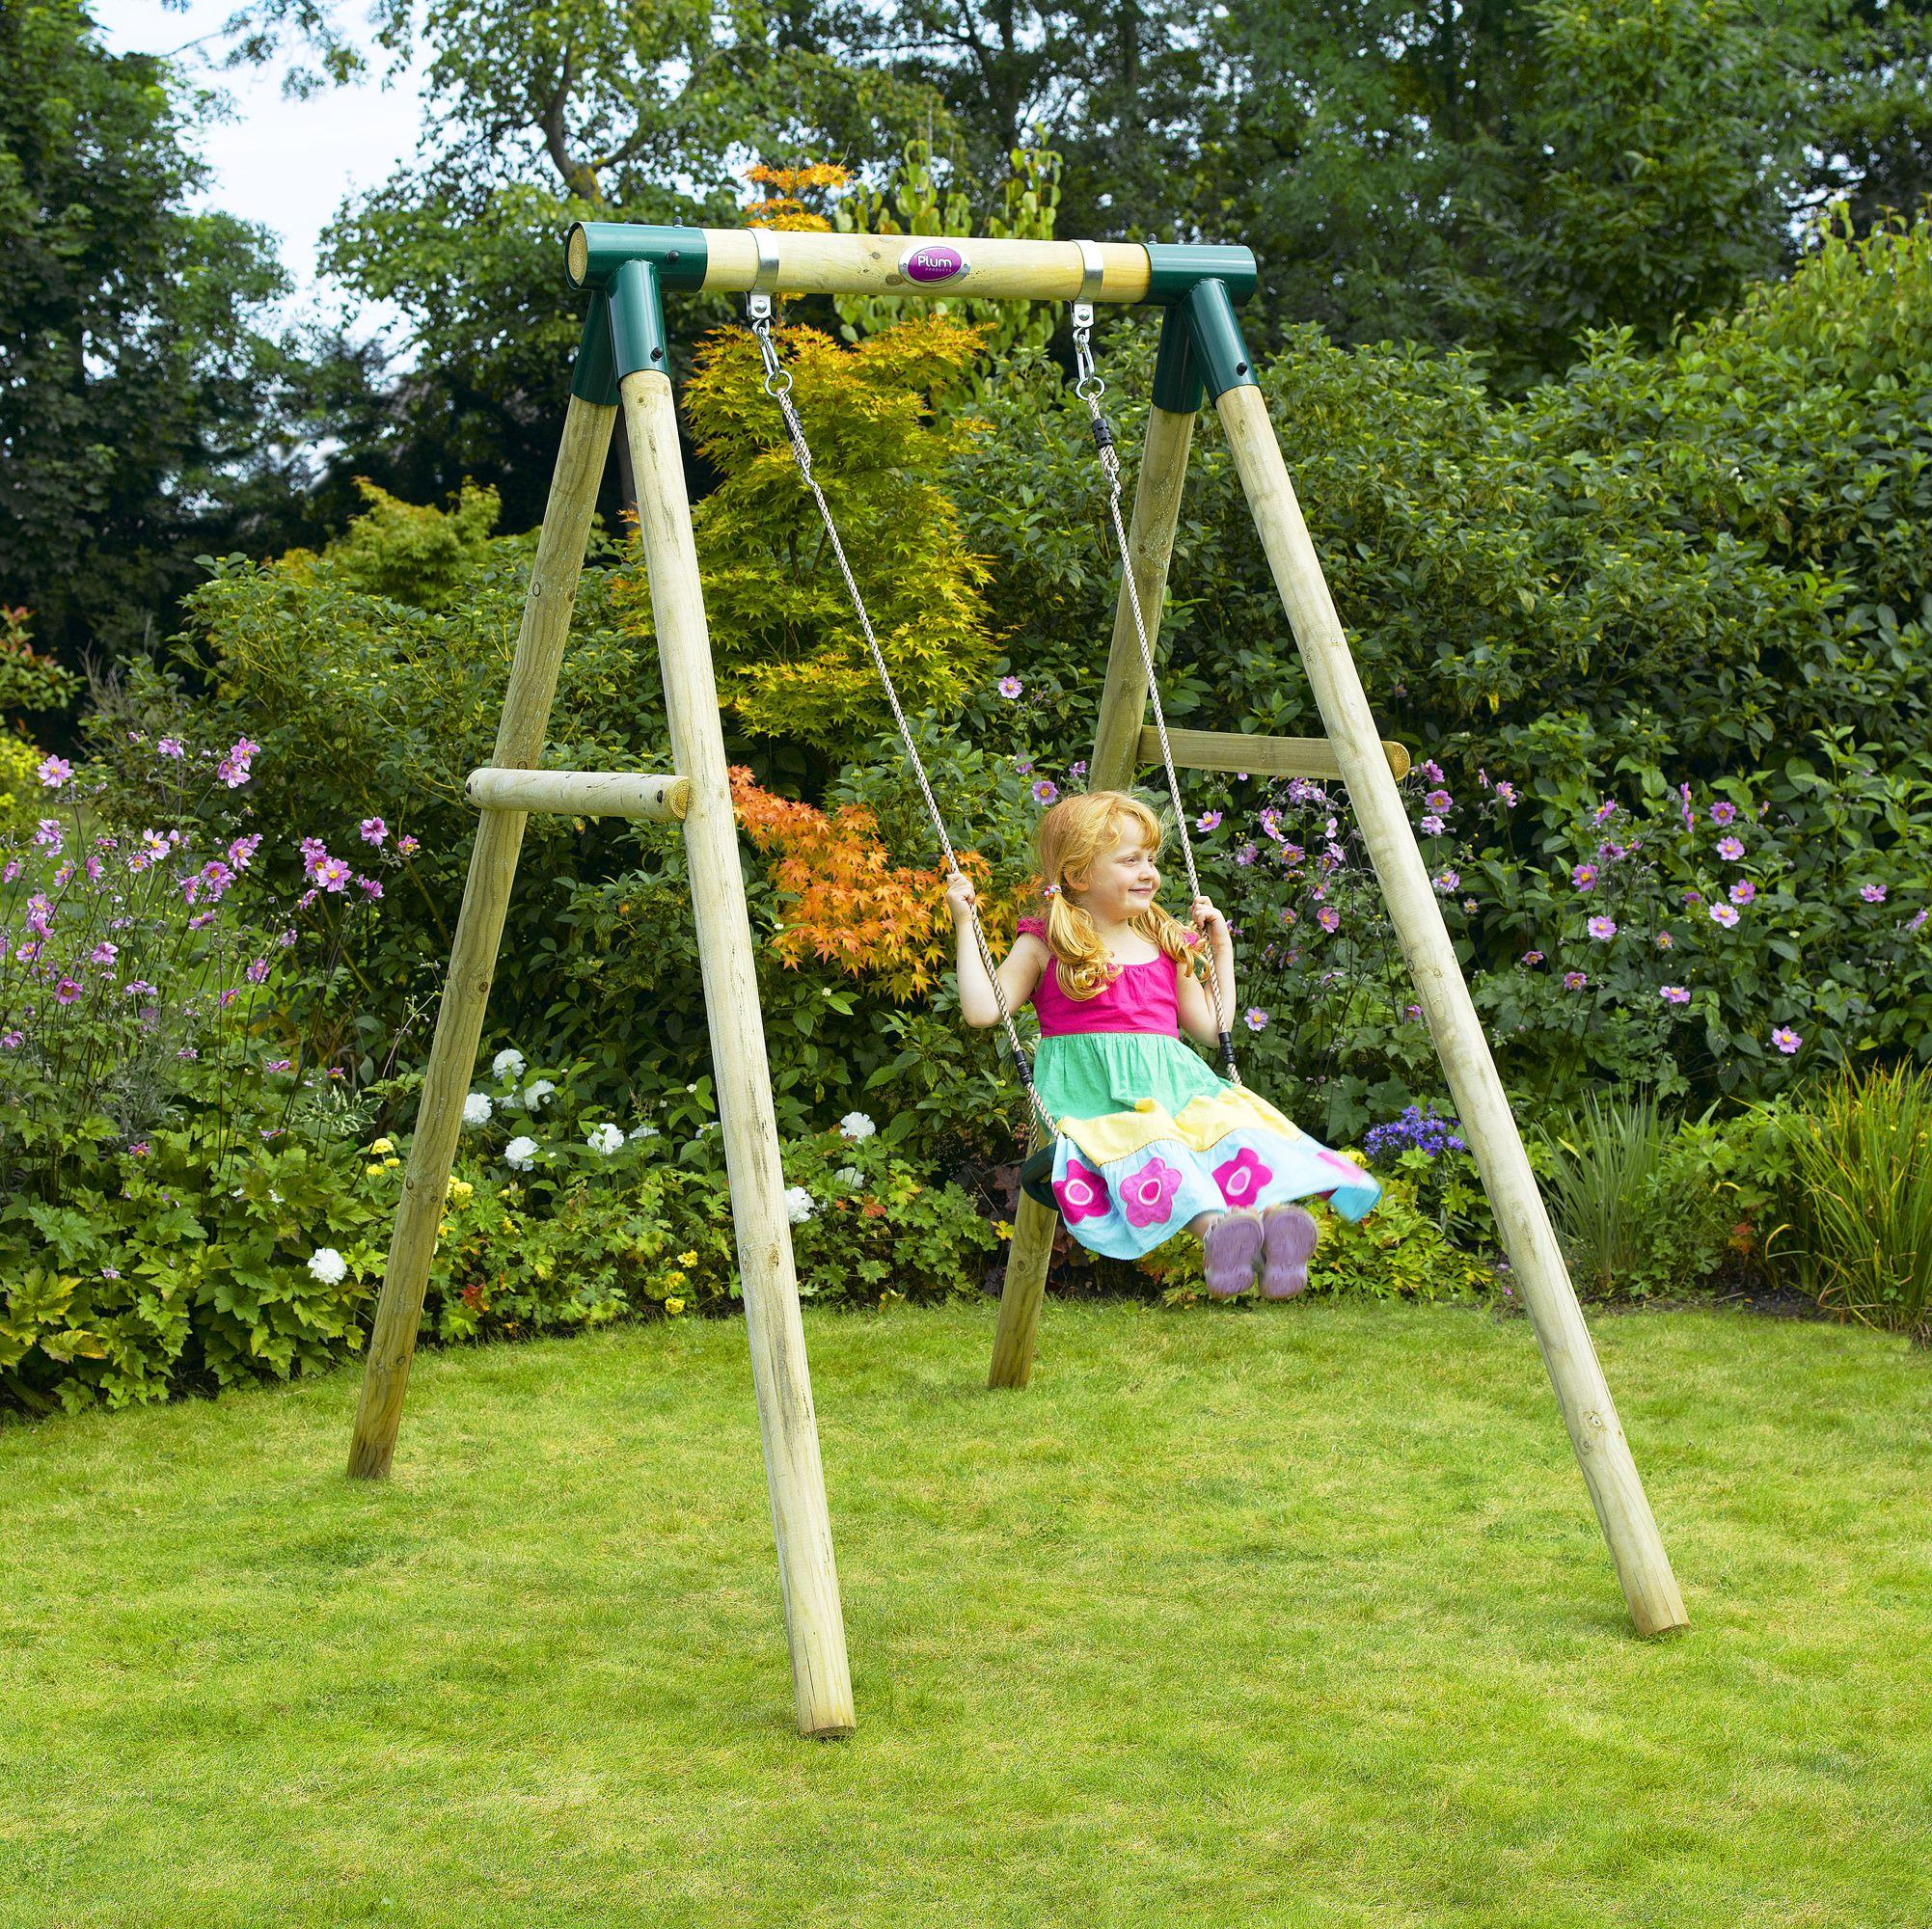 Plum® Bush Baby® Wooden Garden Swing Set   Children Will Love Outdoor Play  With The Plum® Bush Baby® Garden Swing Set! This Wooden Framed Play Set Has  One ...